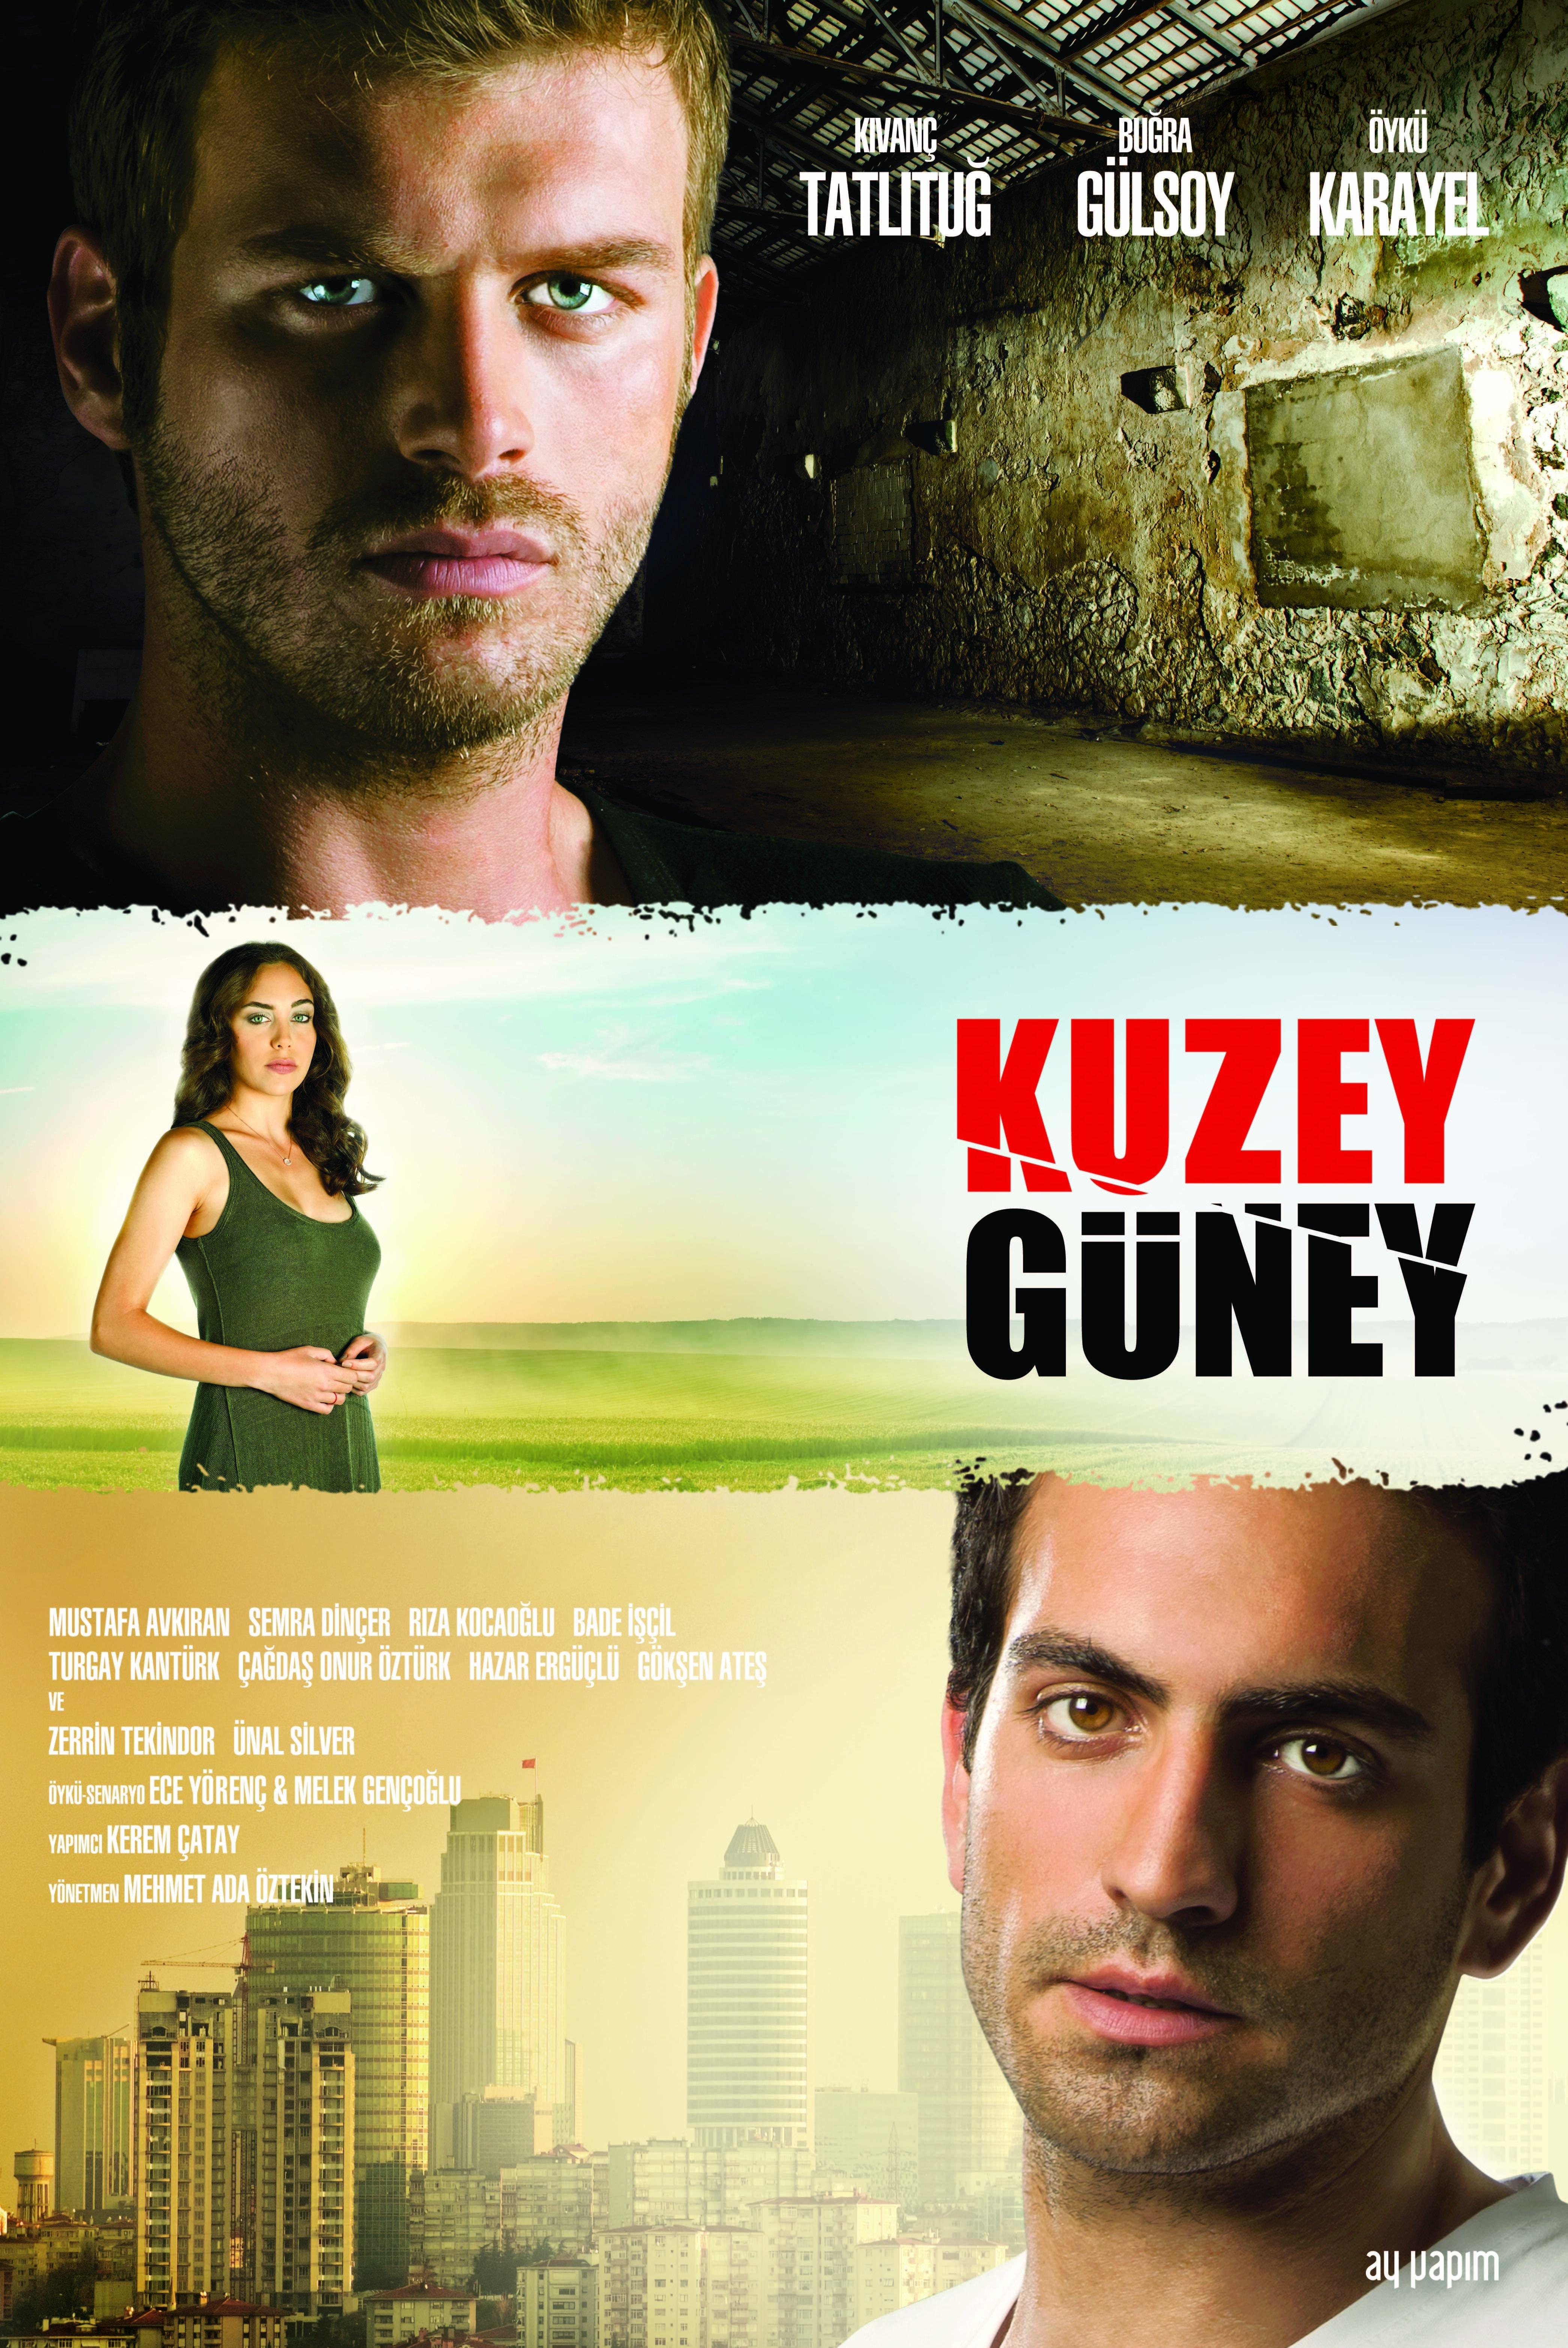 Kivanç Tatlitug, Bugra Gülsoy, and Öykü Karayel in Kuzey Güney (2011)